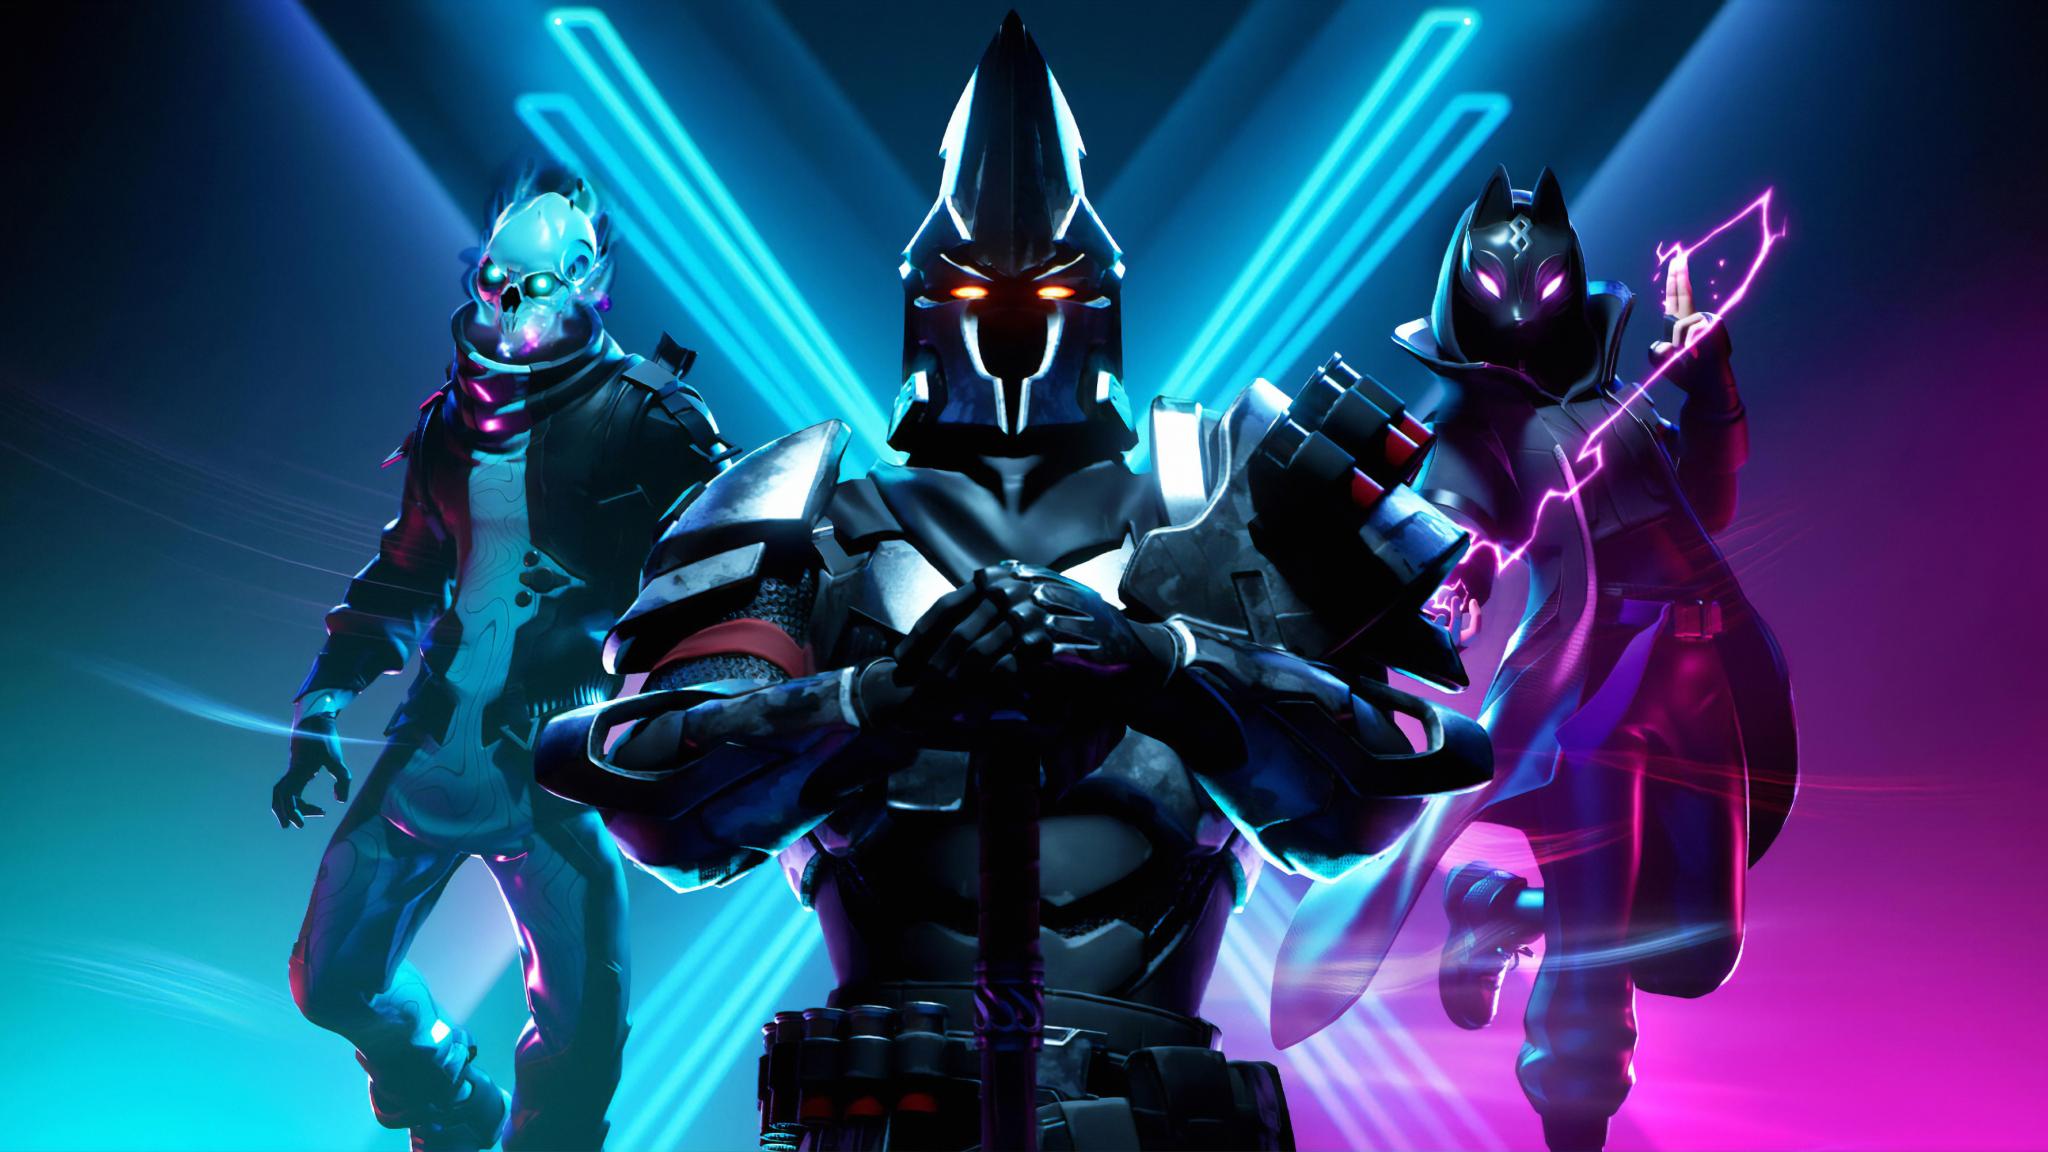 2048x1152 New Fortnite Battle Royale Season 2048x1152